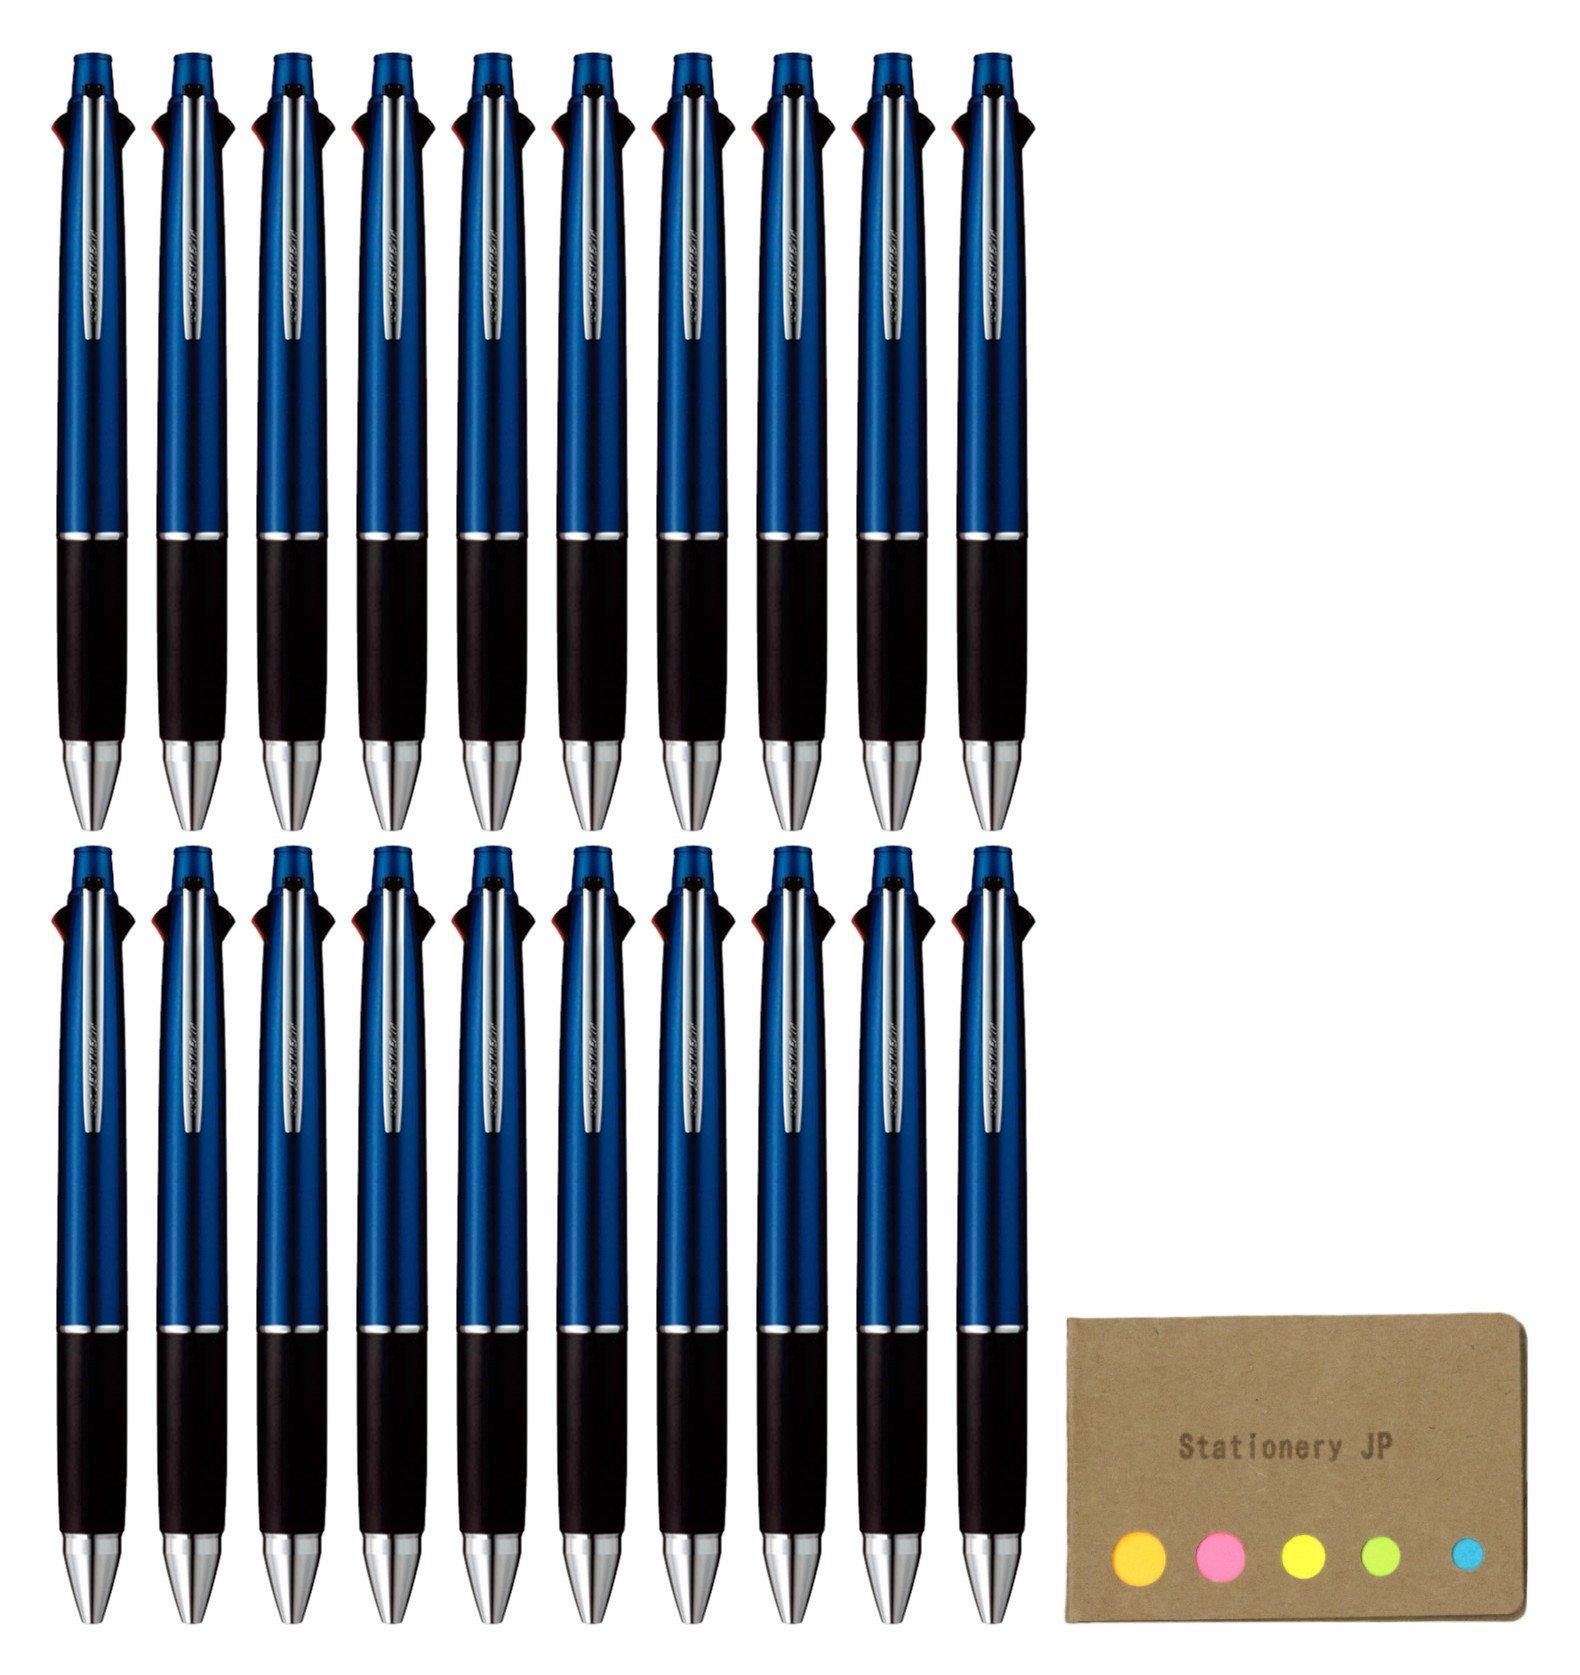 Uni-ball Jetstream 4&1 4 Color Extra Fine Point 0.38mm Ballpoint Multi Pen, Navy Barrel, 20-pack, Sticky Notes Value Set